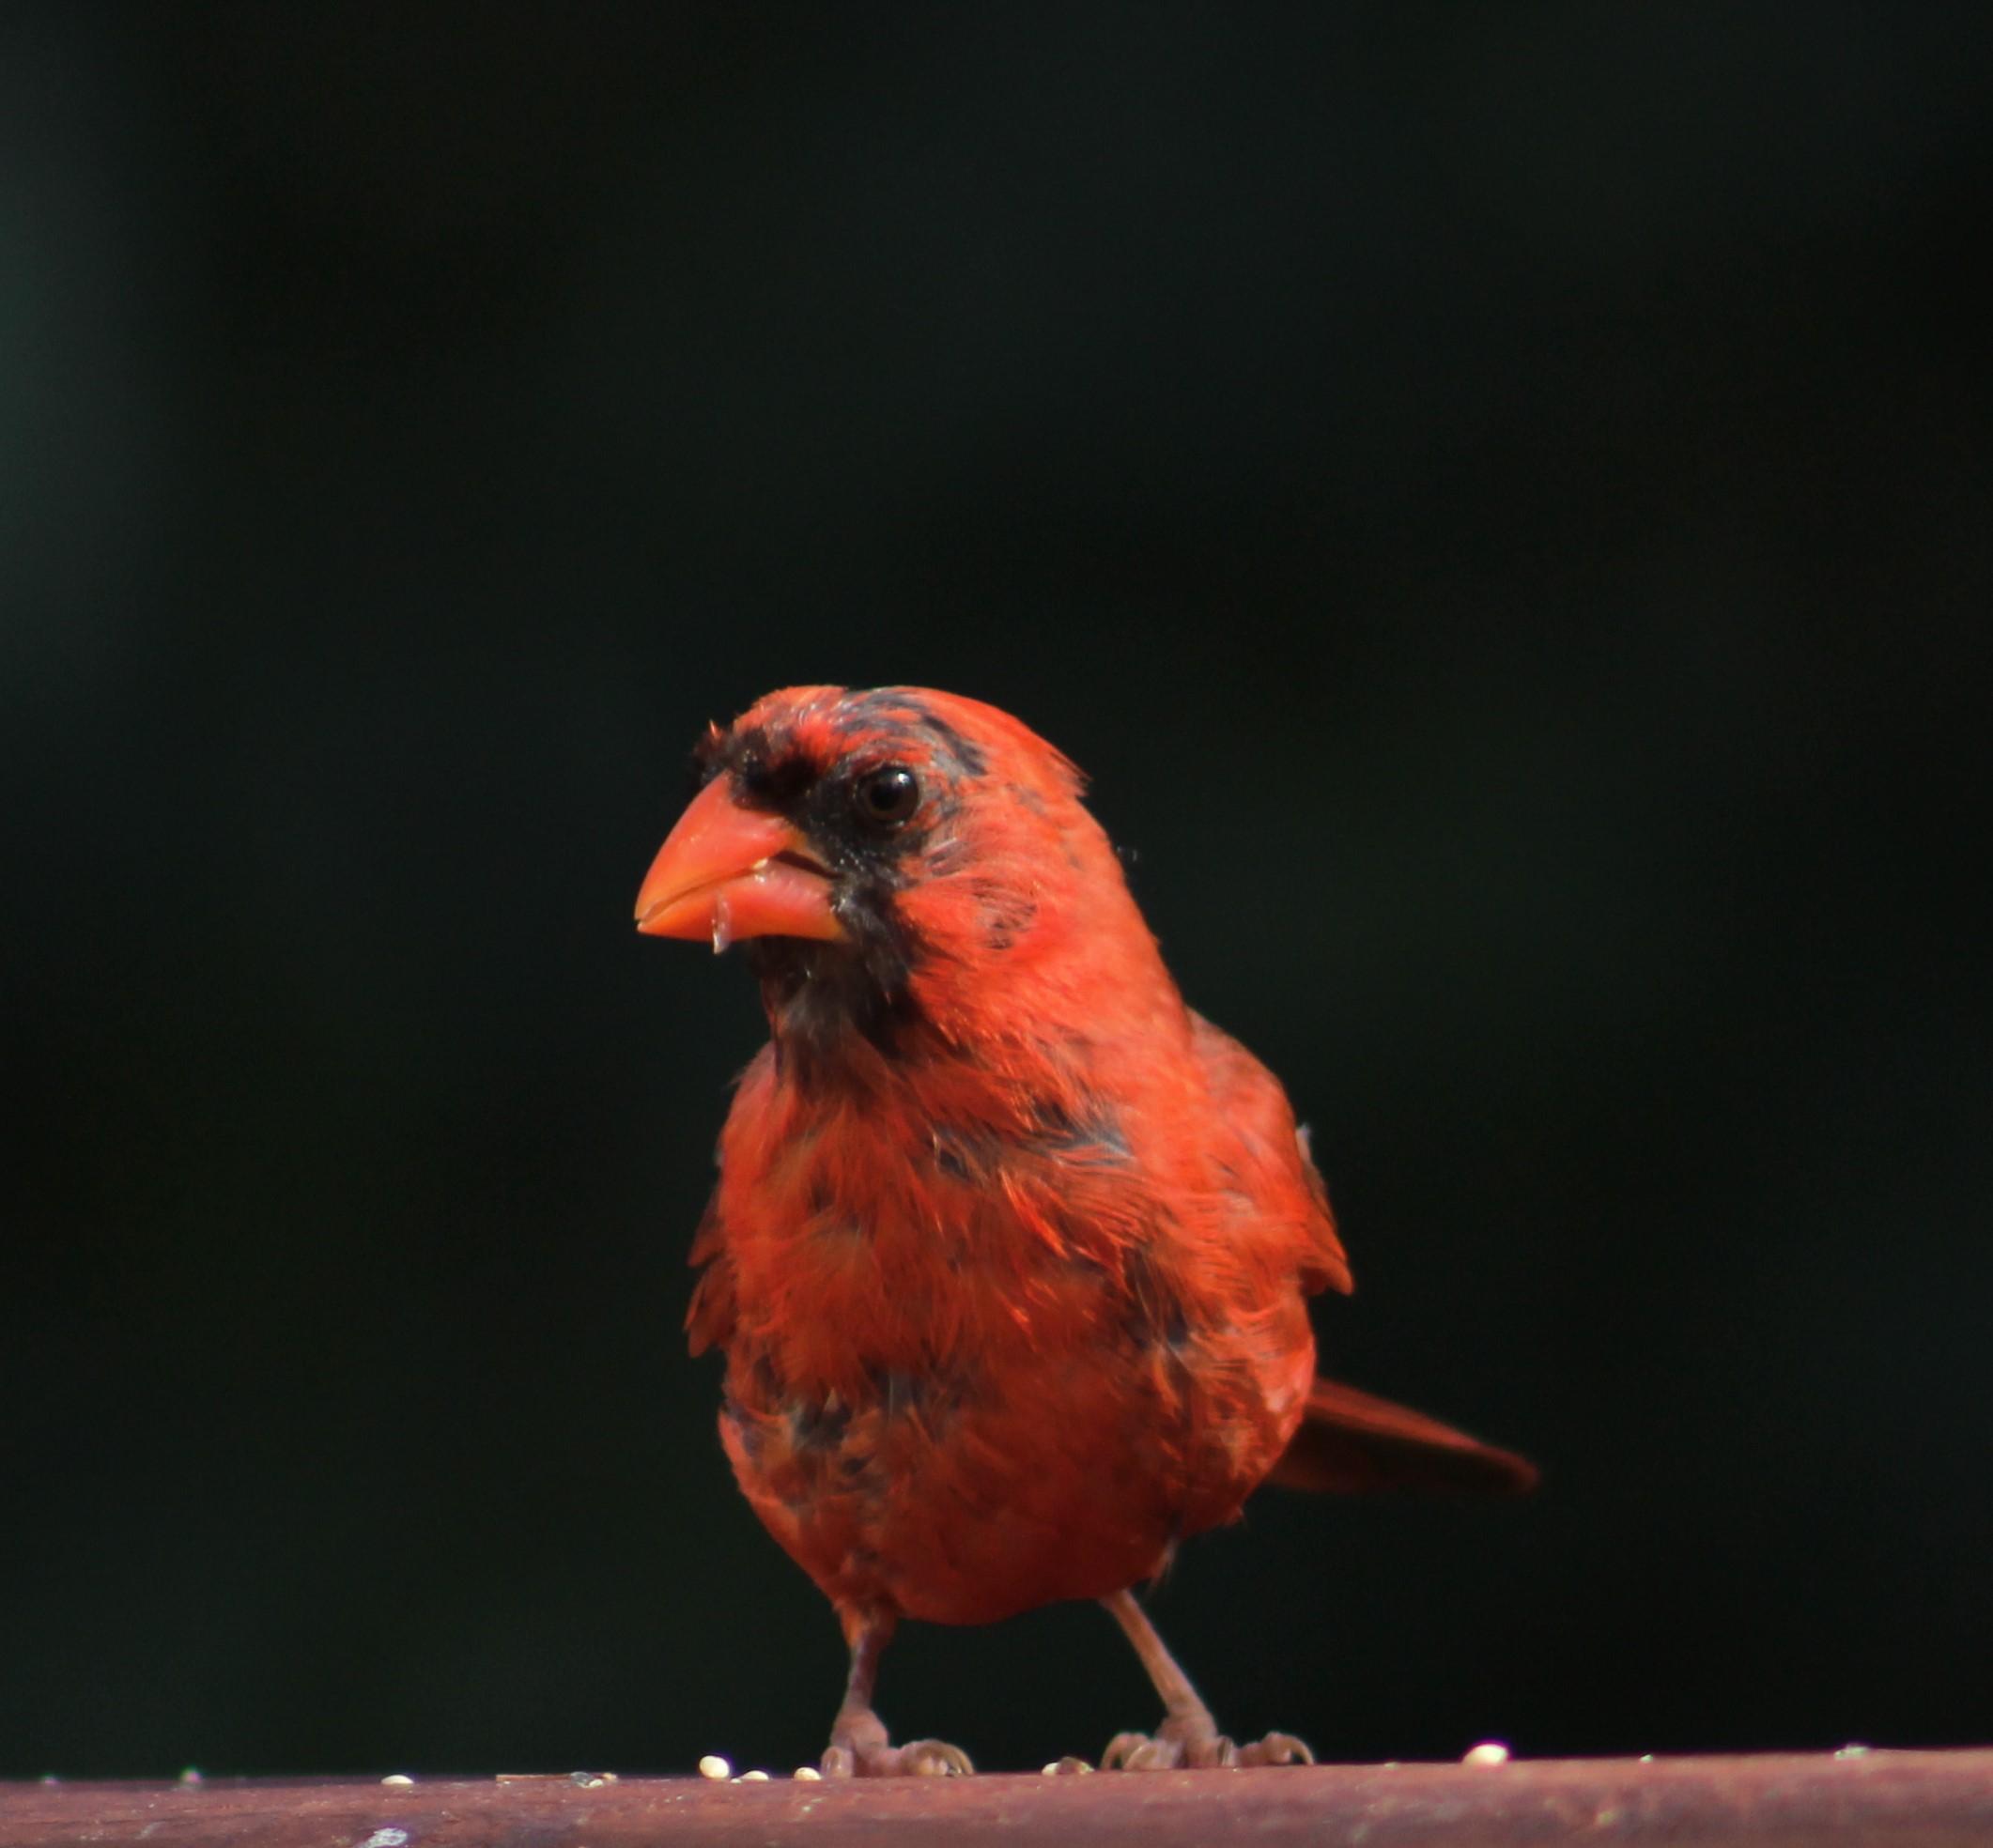 Molting papa cardinal